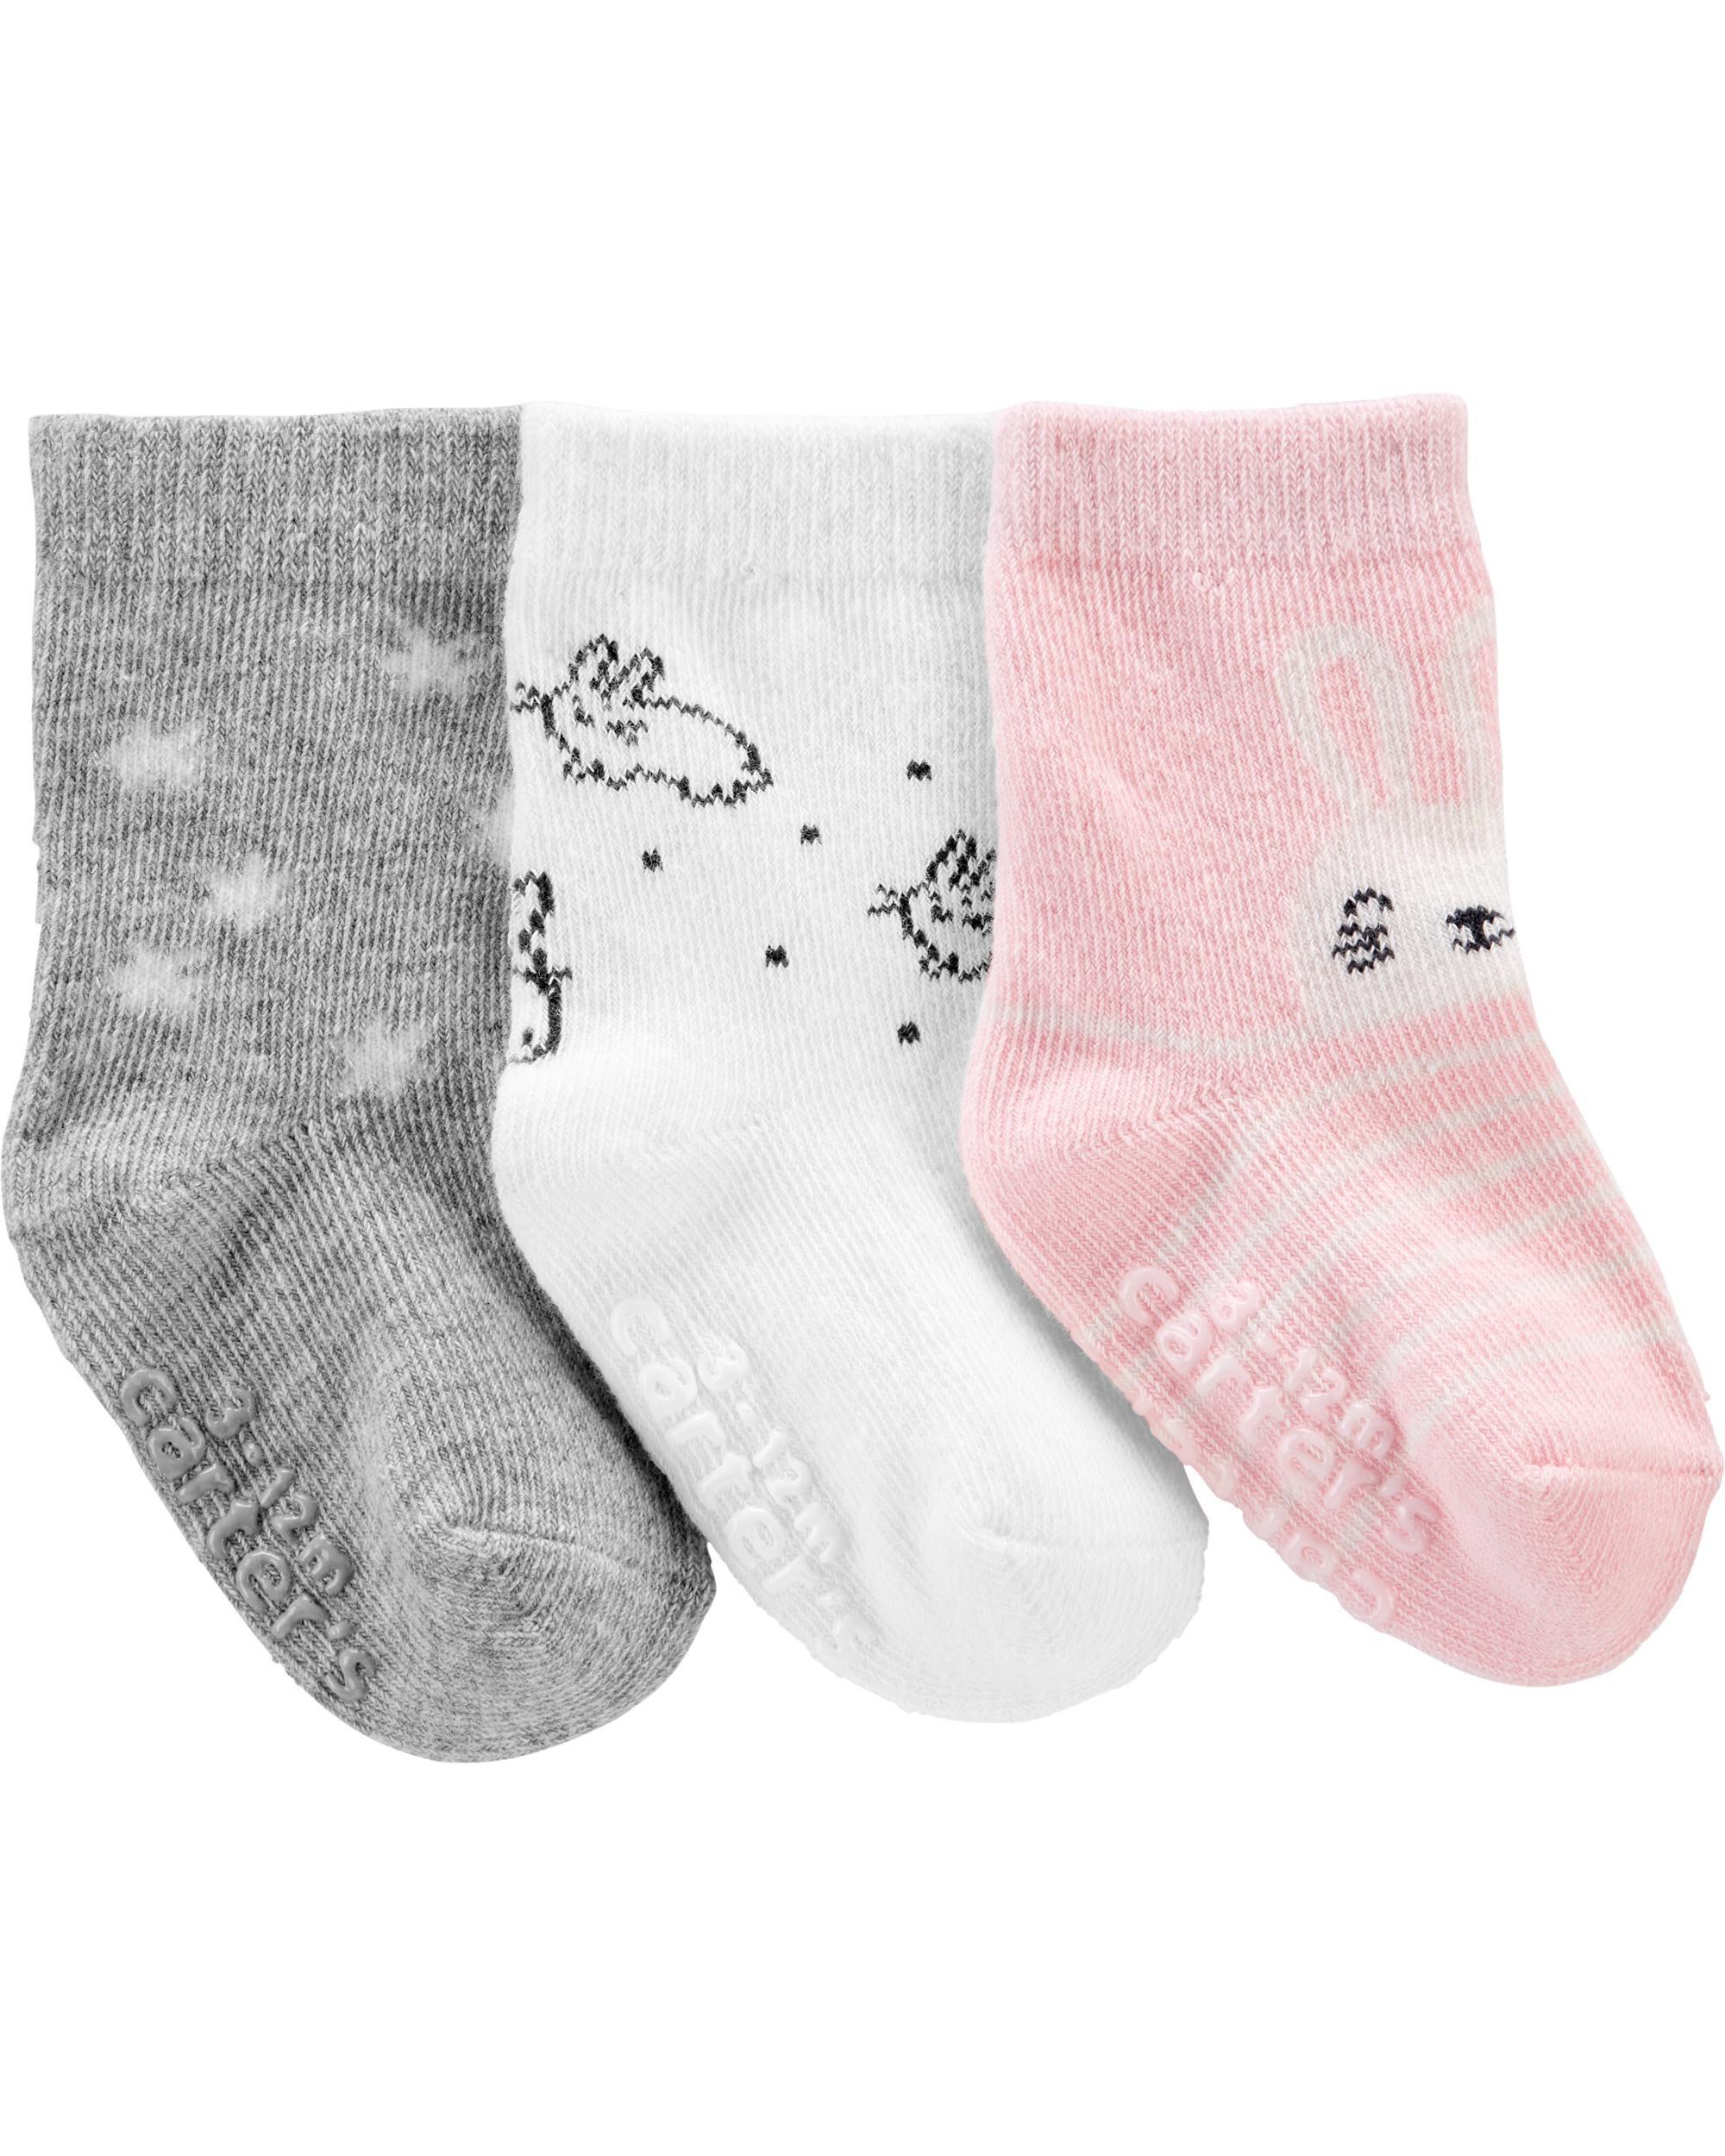 *CLEARANCE* 3-Pack Bunny Crew Socks